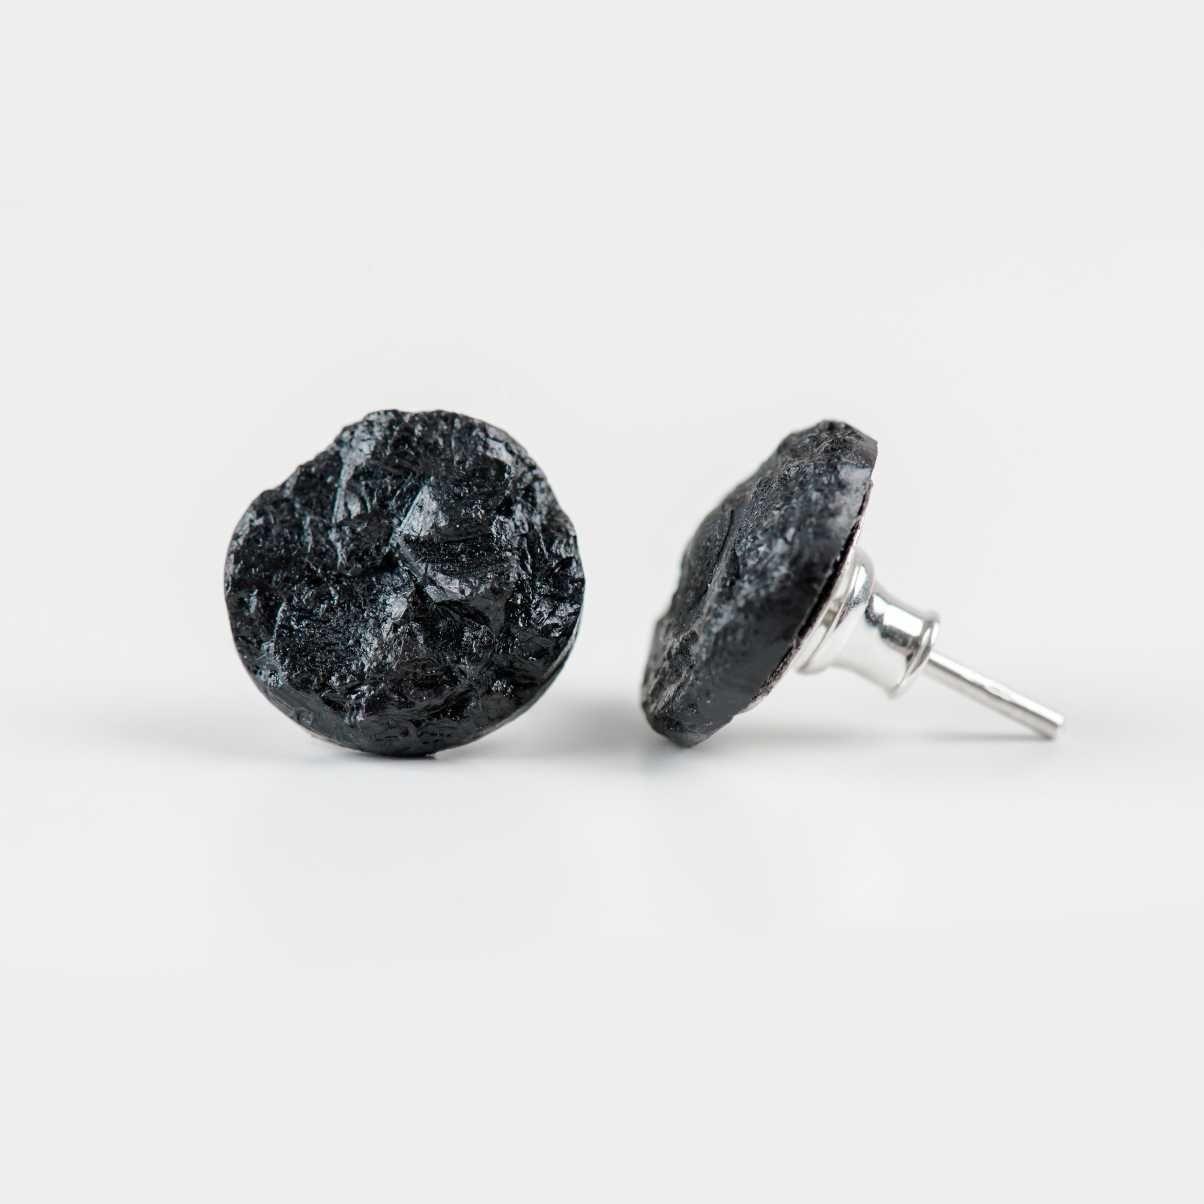 Kolczyki regularne z węgla pln dodatki pinterest brokat